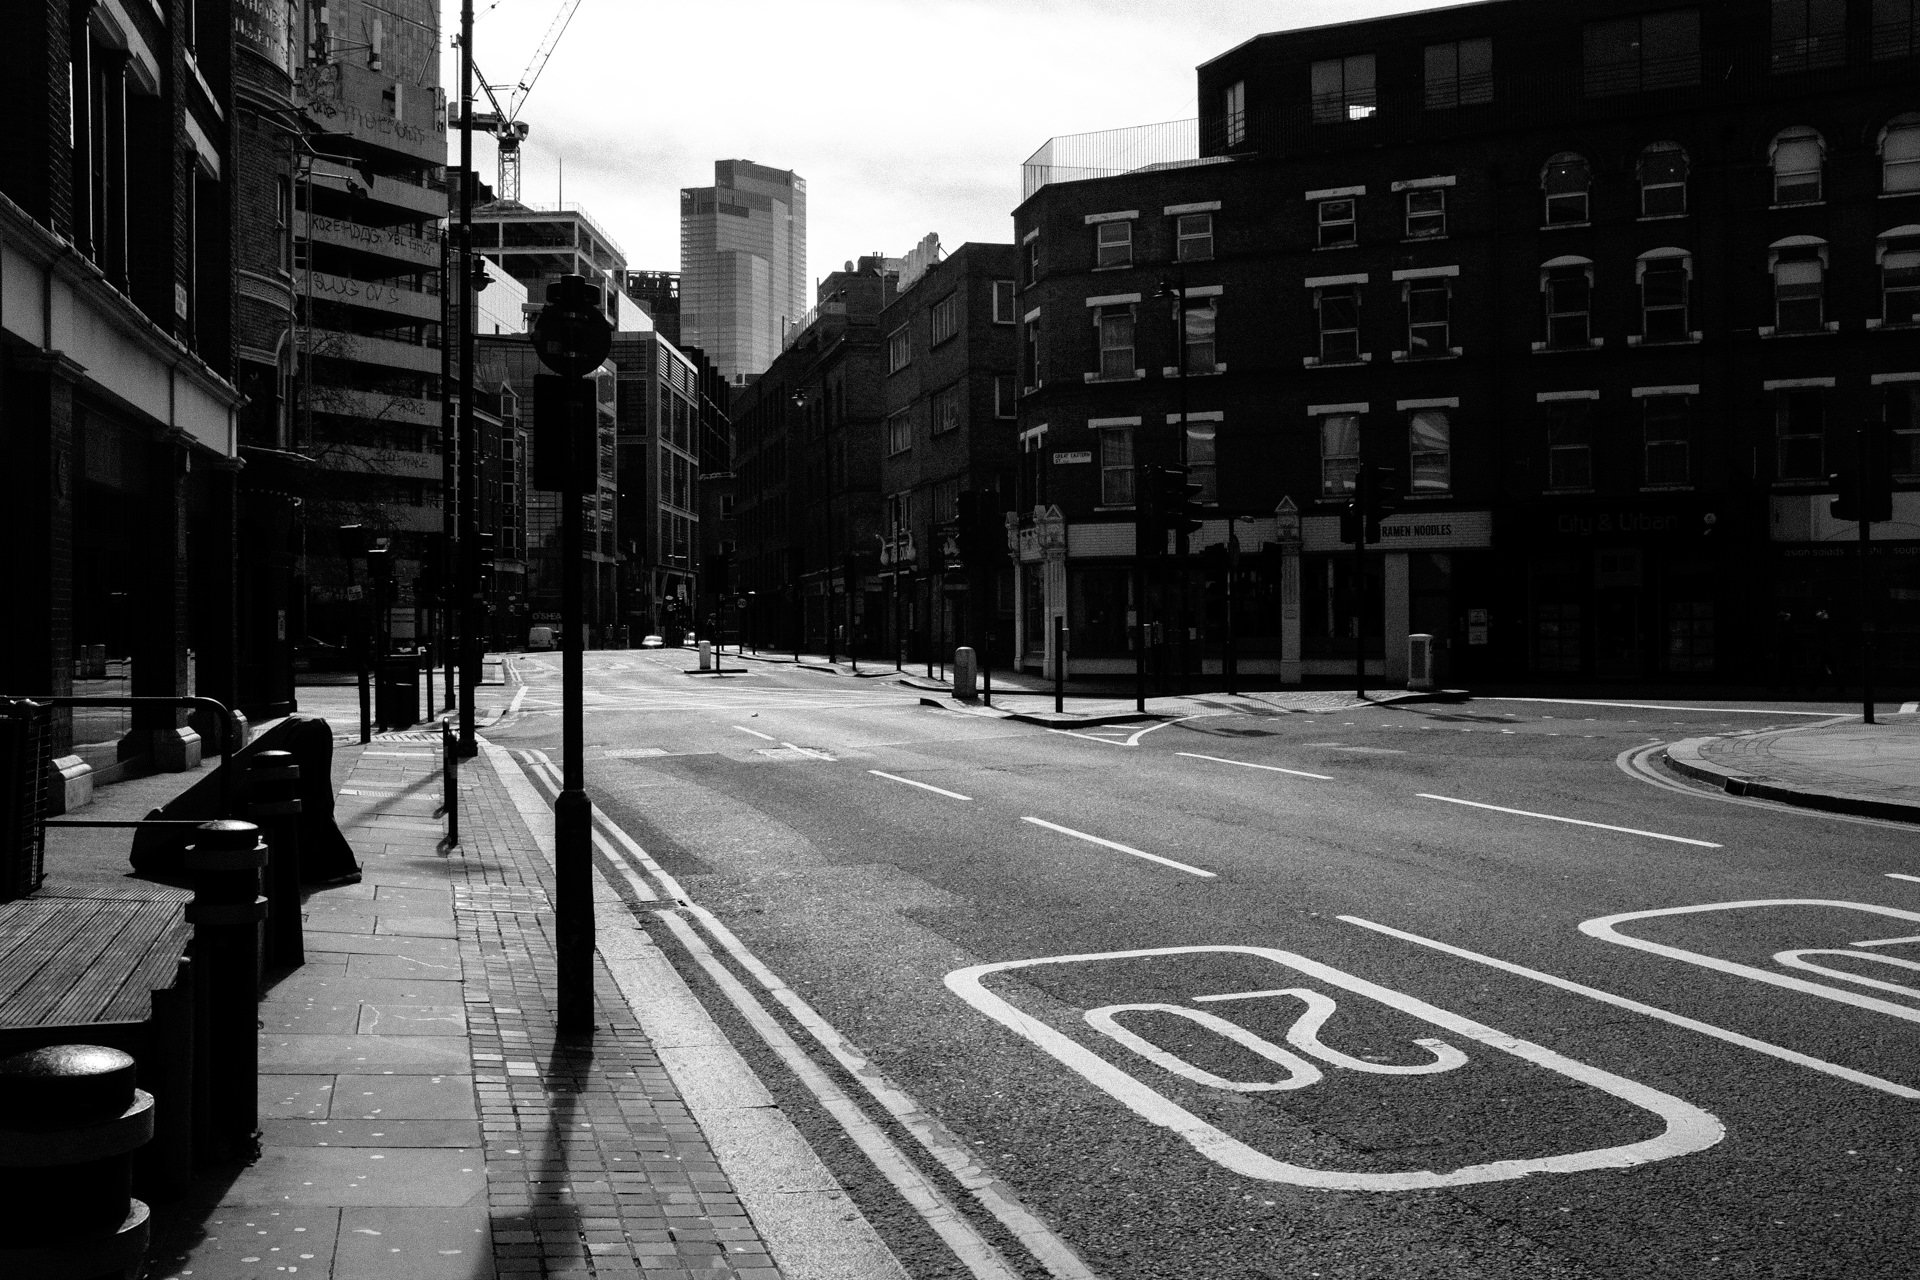 enpty london streets during corona virus